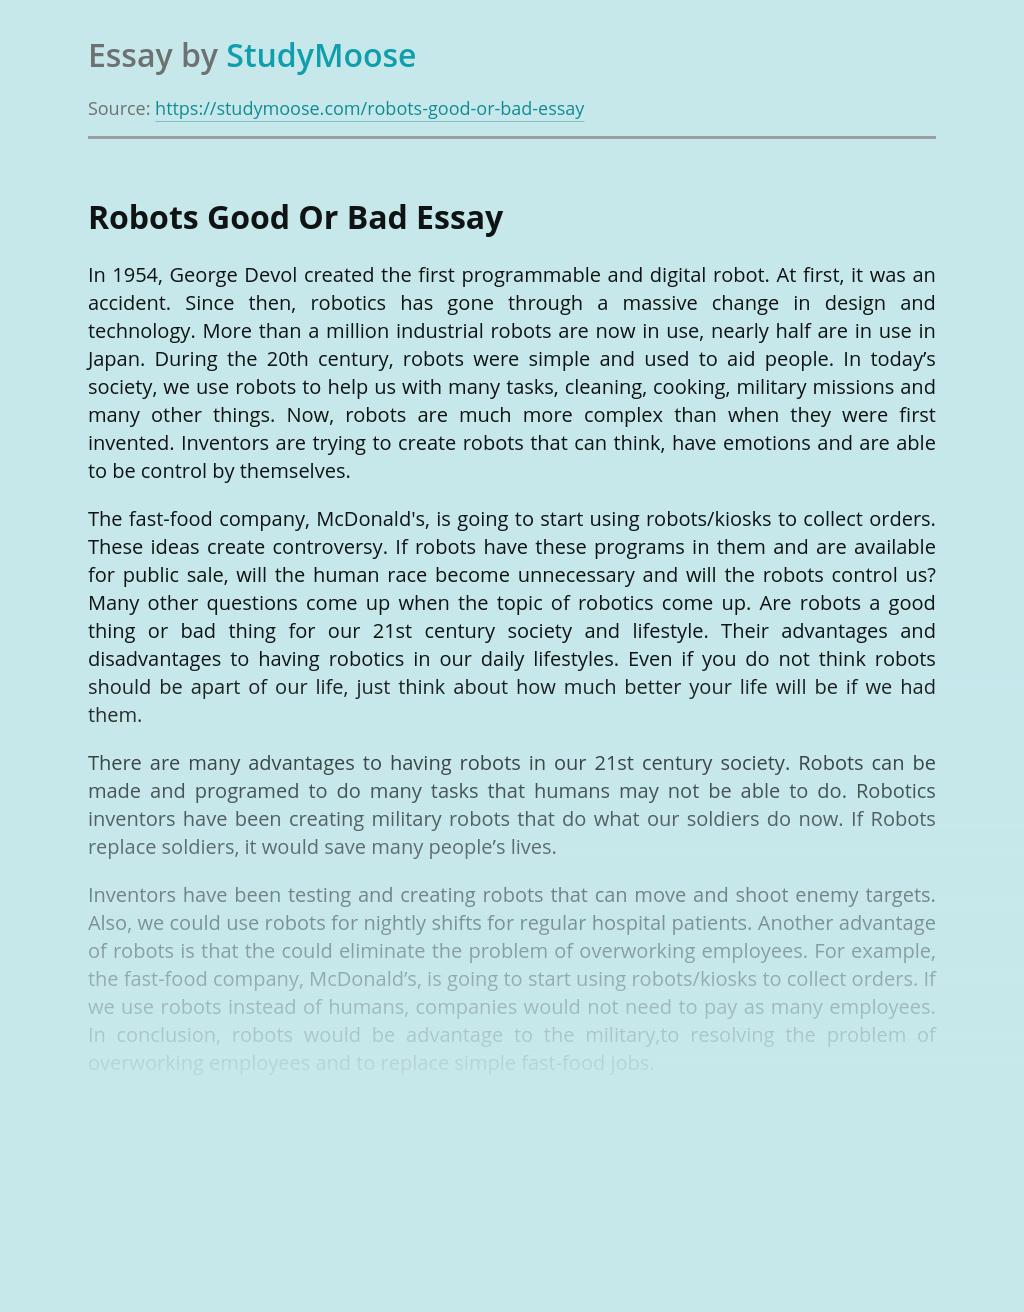 Robots Good Or Bad